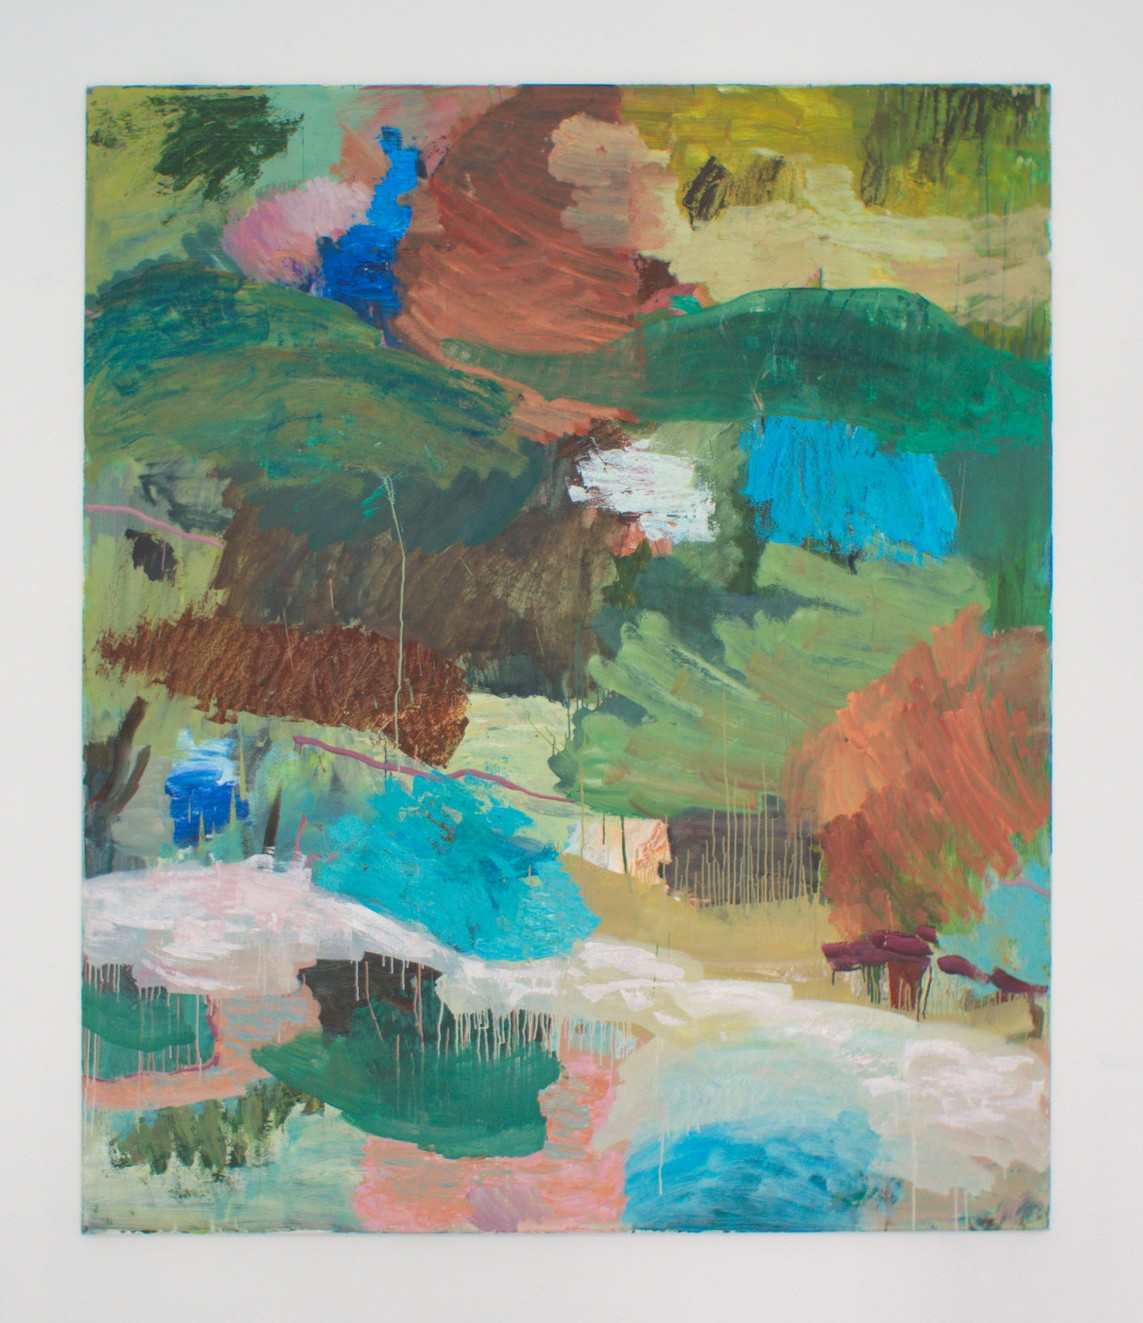 OT Nr. 26, 2016, Öl auf Leinwand, 200 x 170 cm